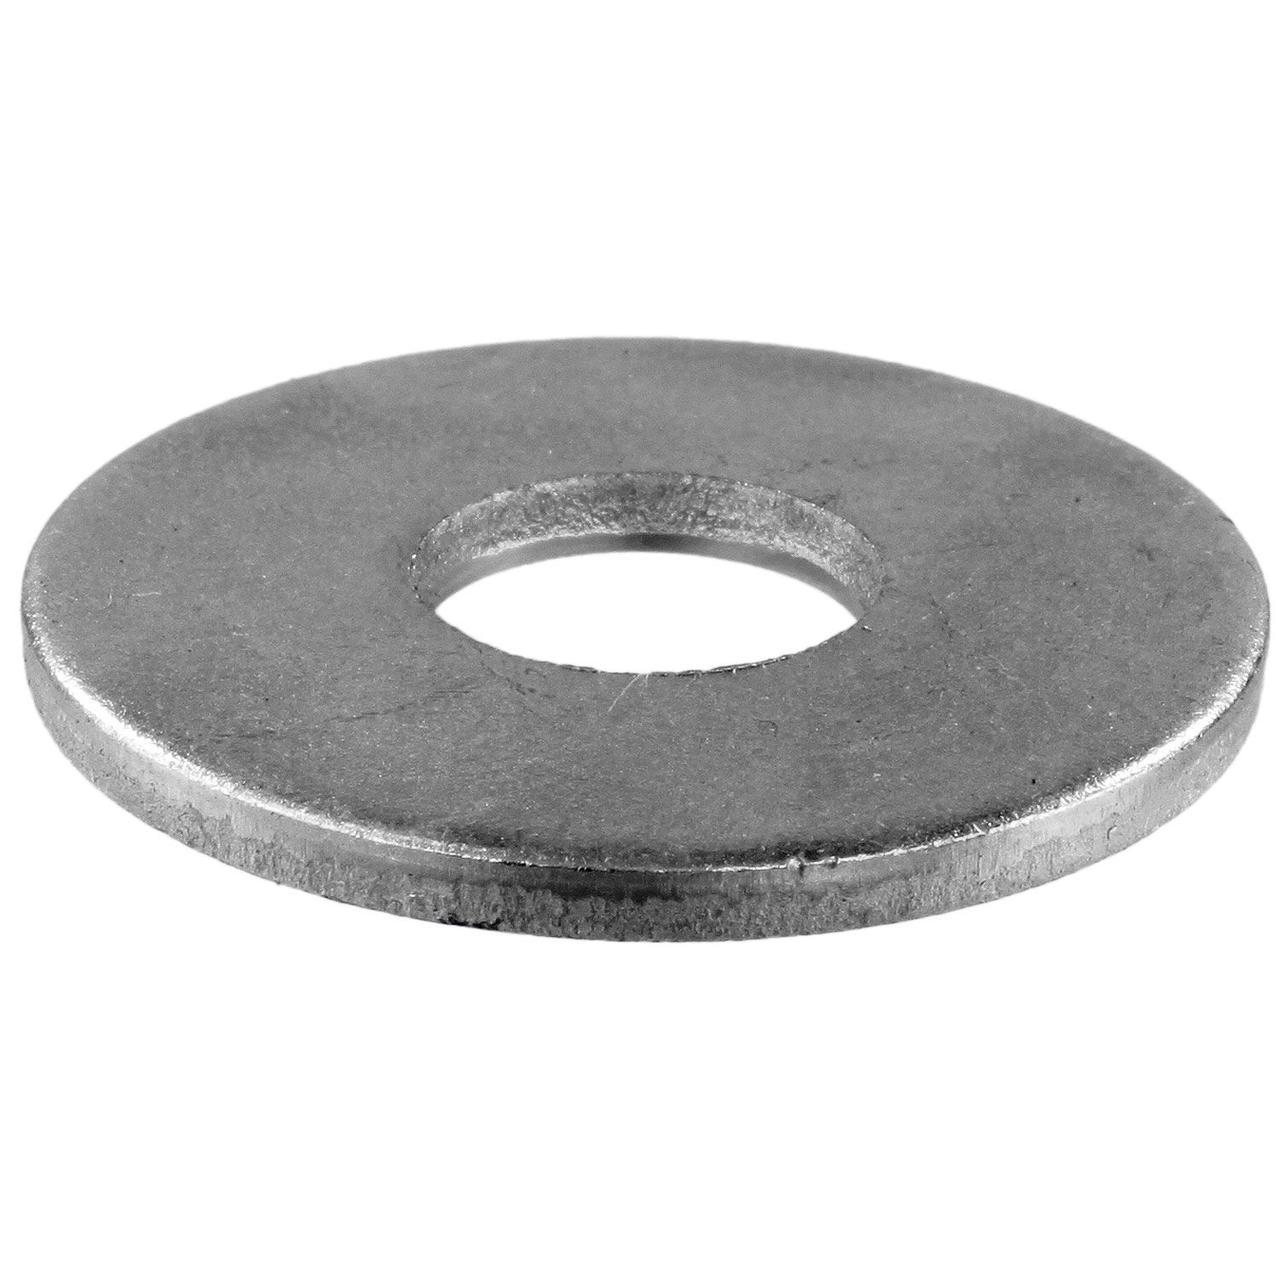 Кольцо ст 30ХГСА 240х85х110 мм